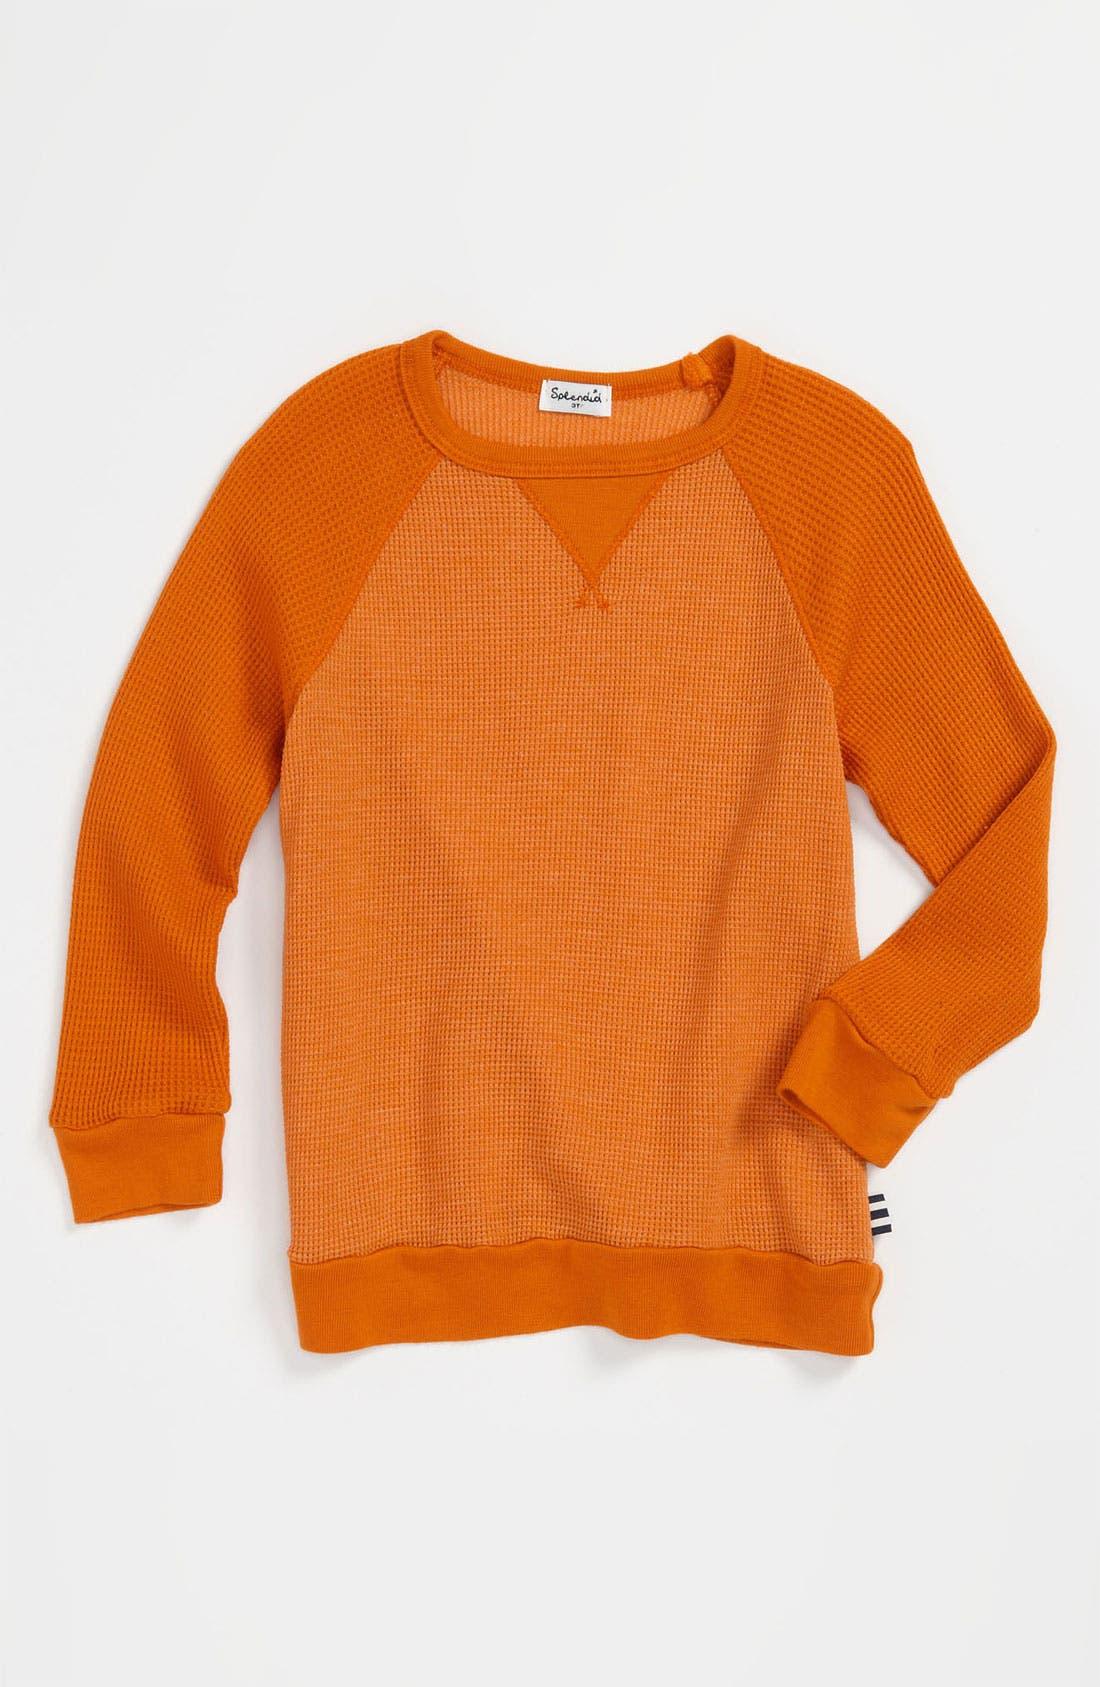 Alternate Image 1 Selected - Splendid 'Fletcher' Thermal T-Shirt (Toddler)